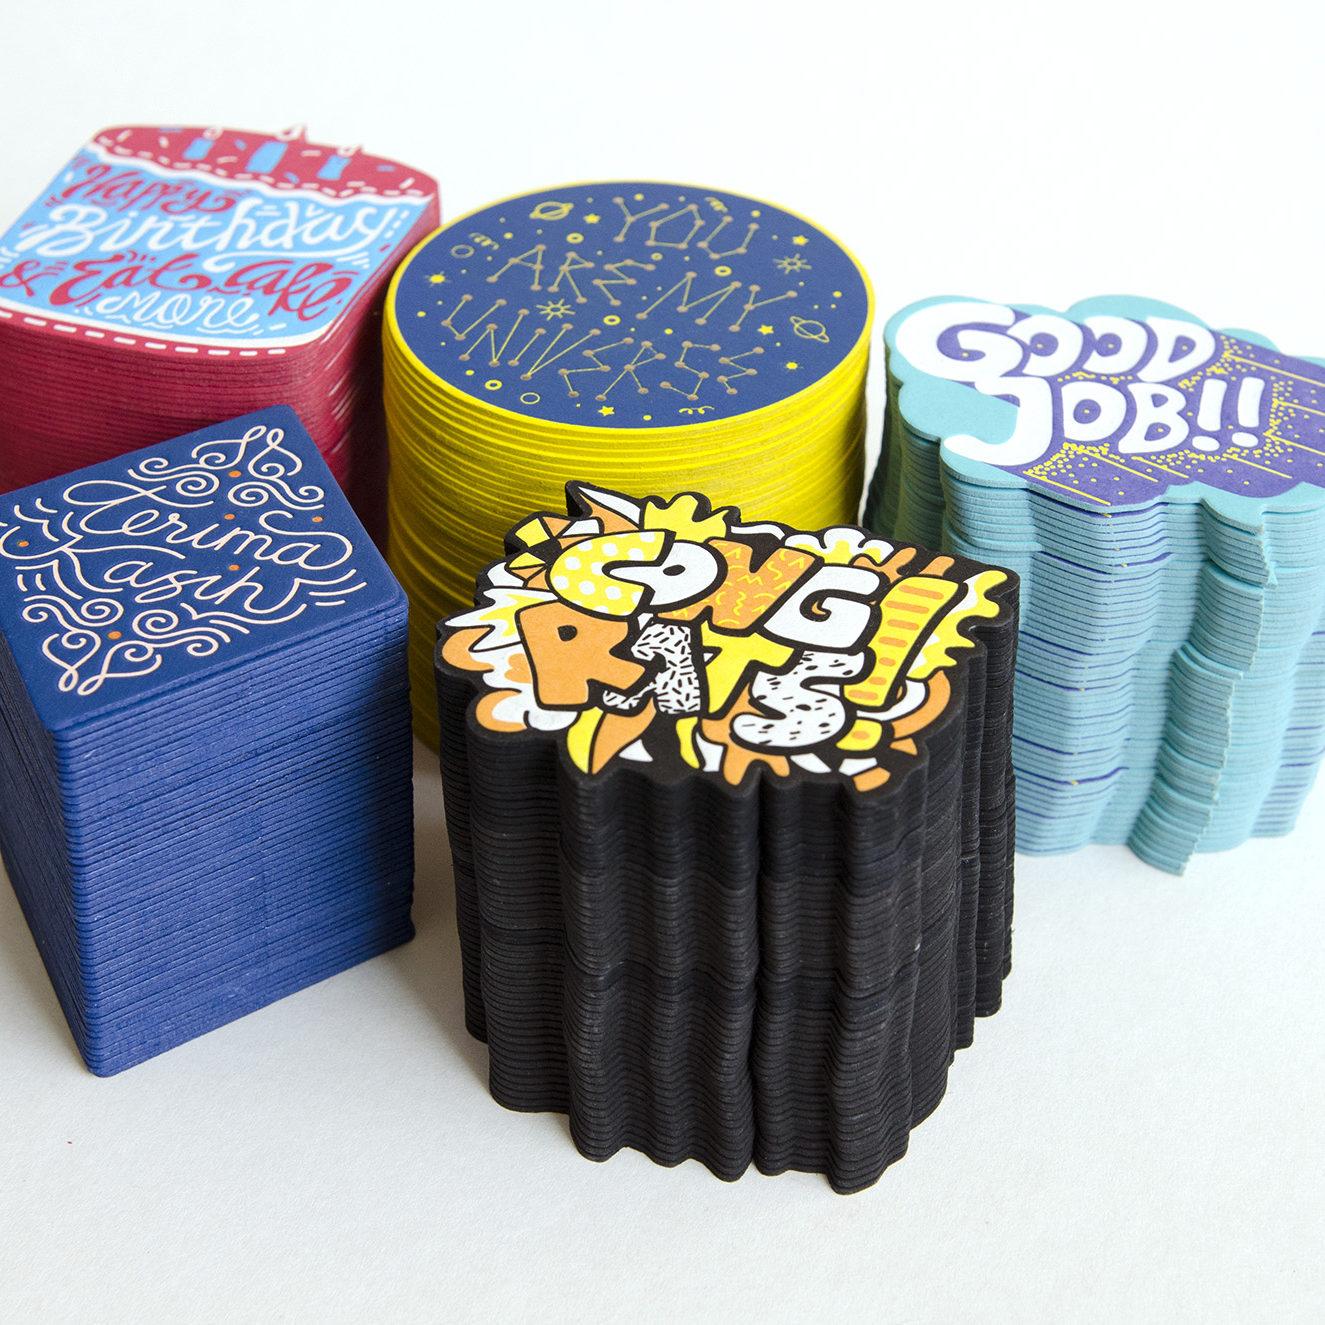 Kyub mini greeting cards mini greeting cards kristyandbryce Gallery